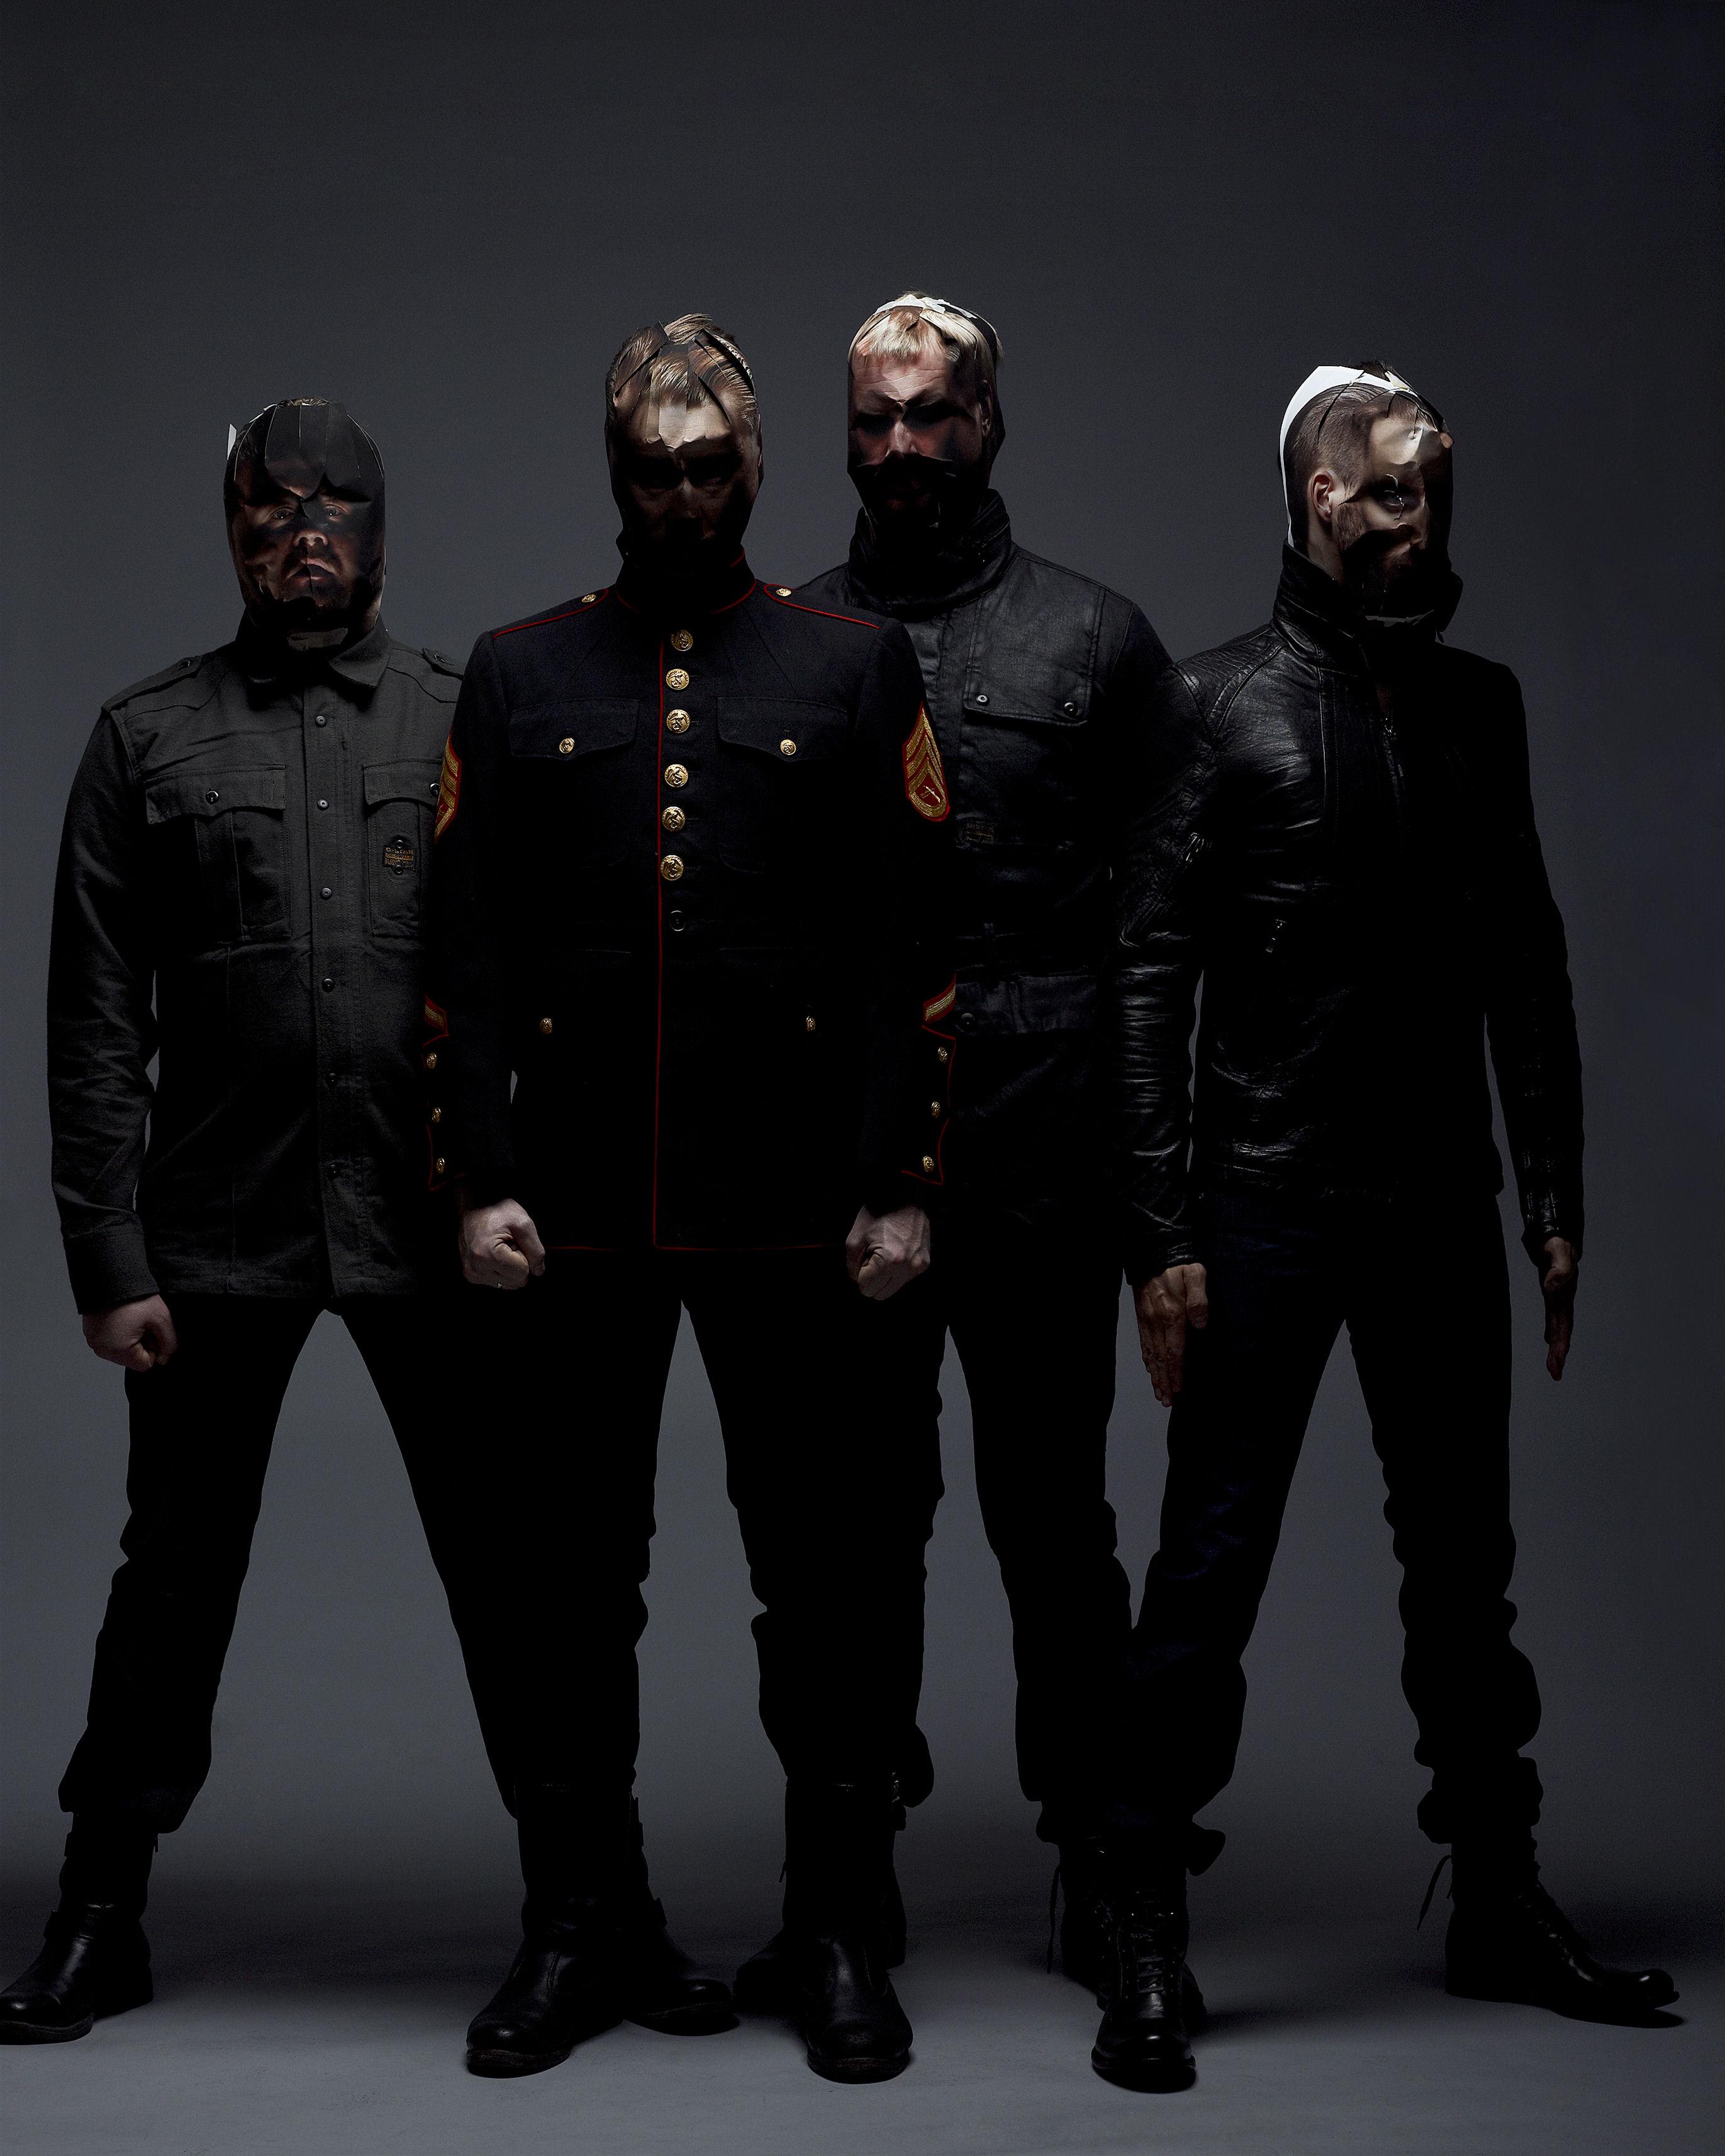 File:Shining-band-2009...